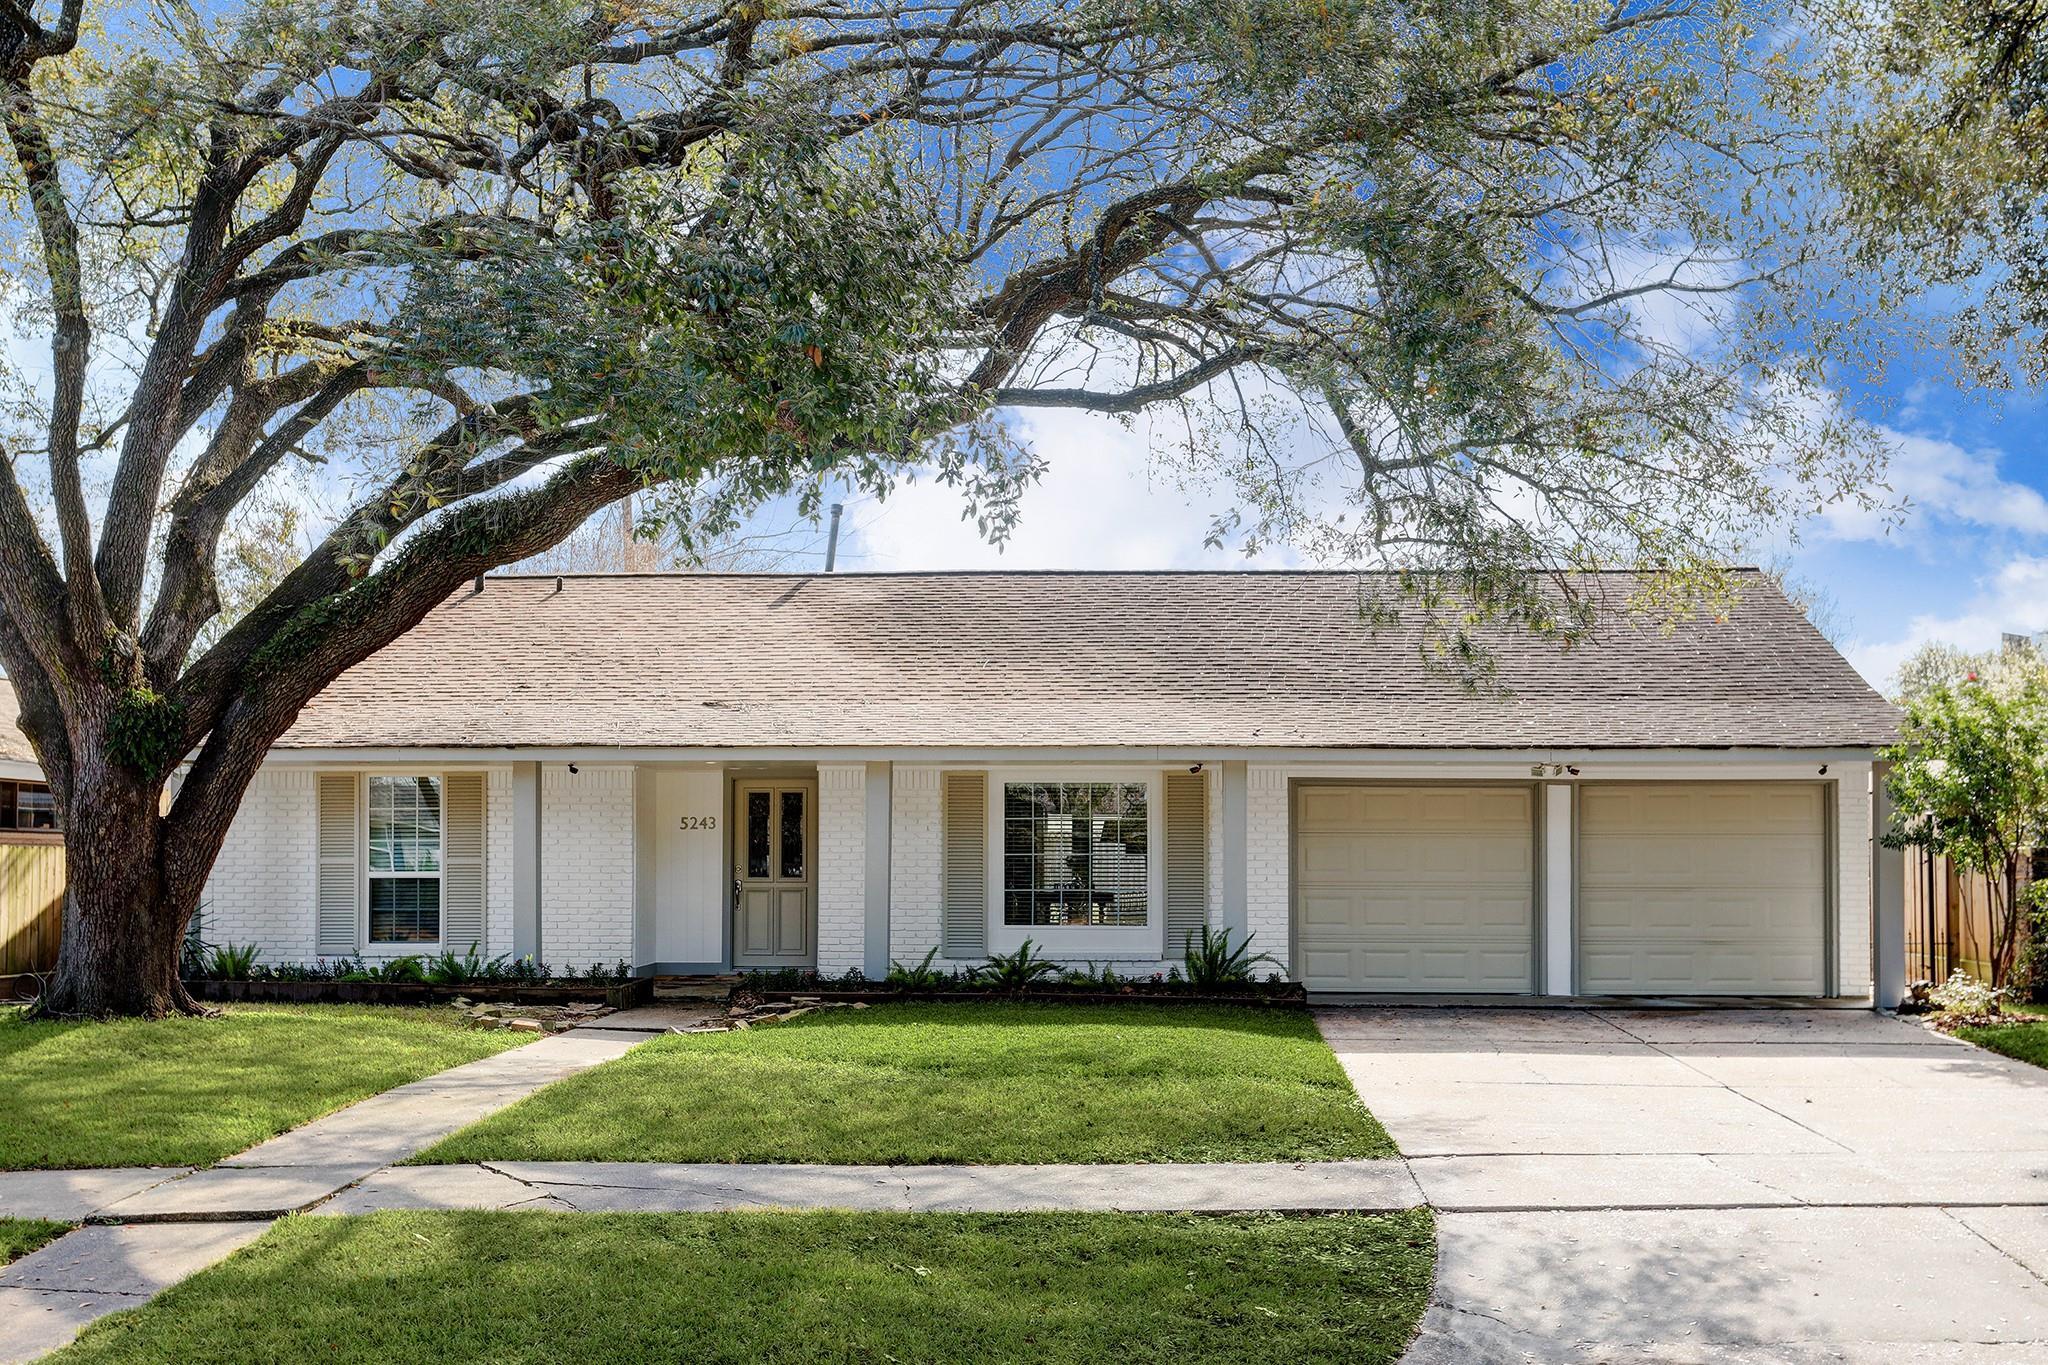 5243 Lamonte Lane Property Photo - Houston, TX real estate listing